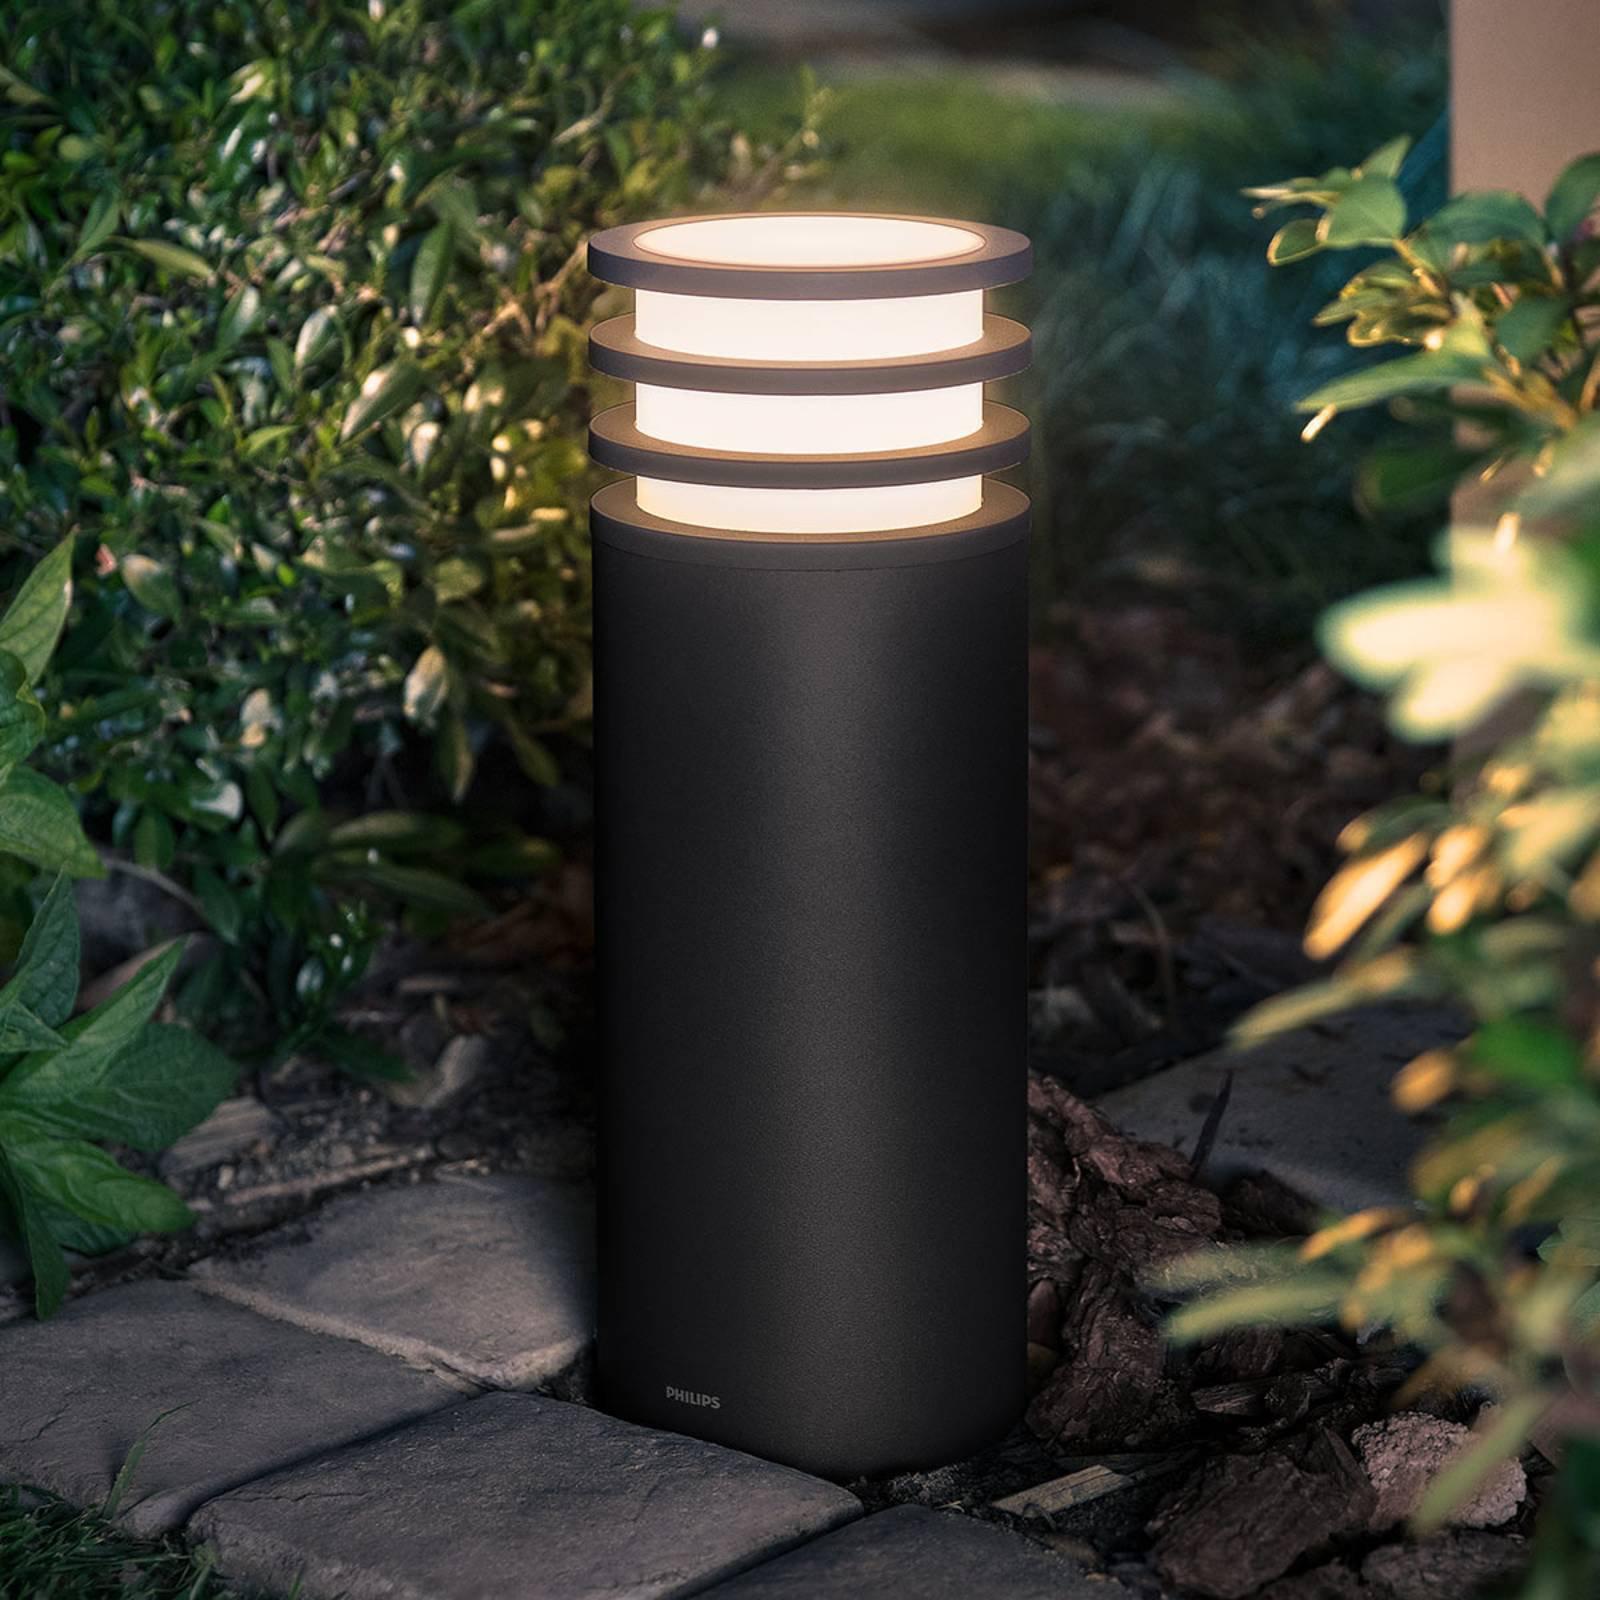 Philips Hue-LED-sokkellampe Lucca, appstyring